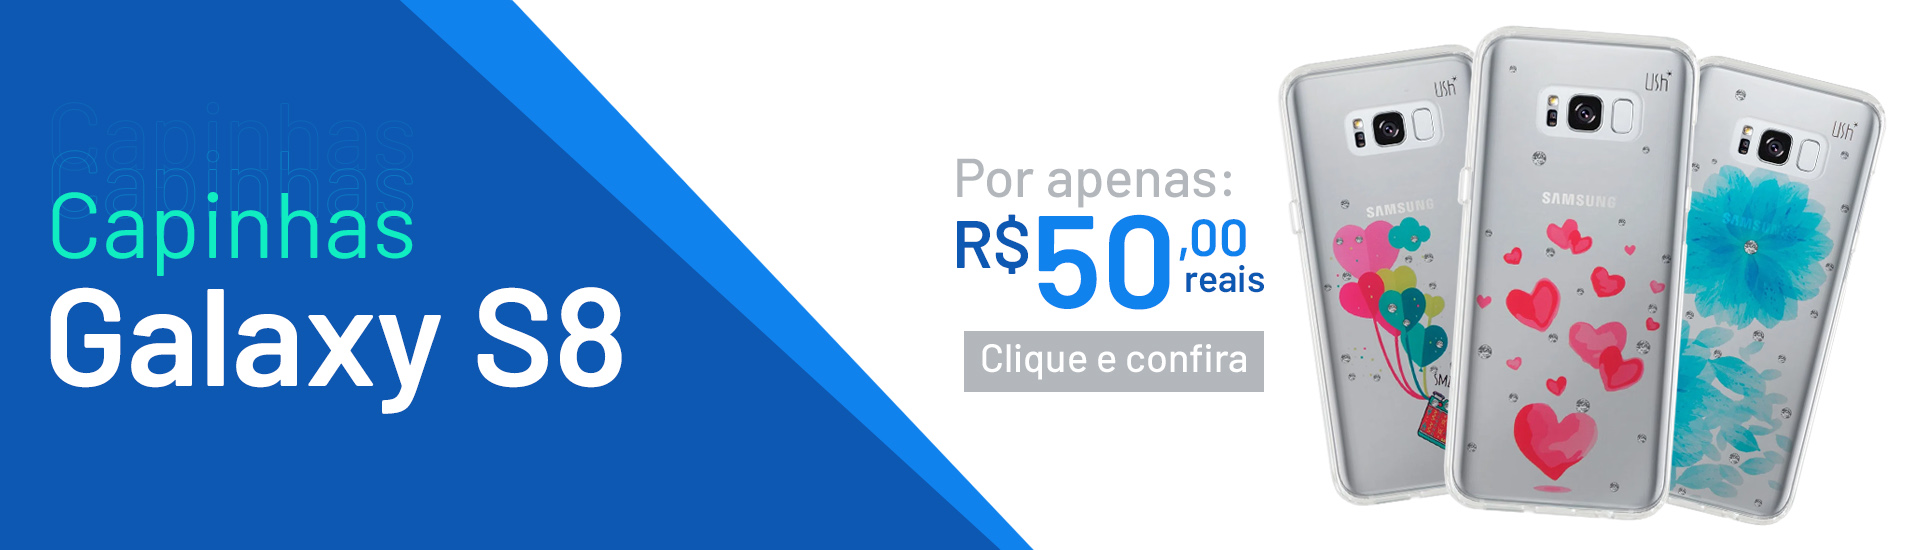 02 SamsungS8 | Desktop 1920x550